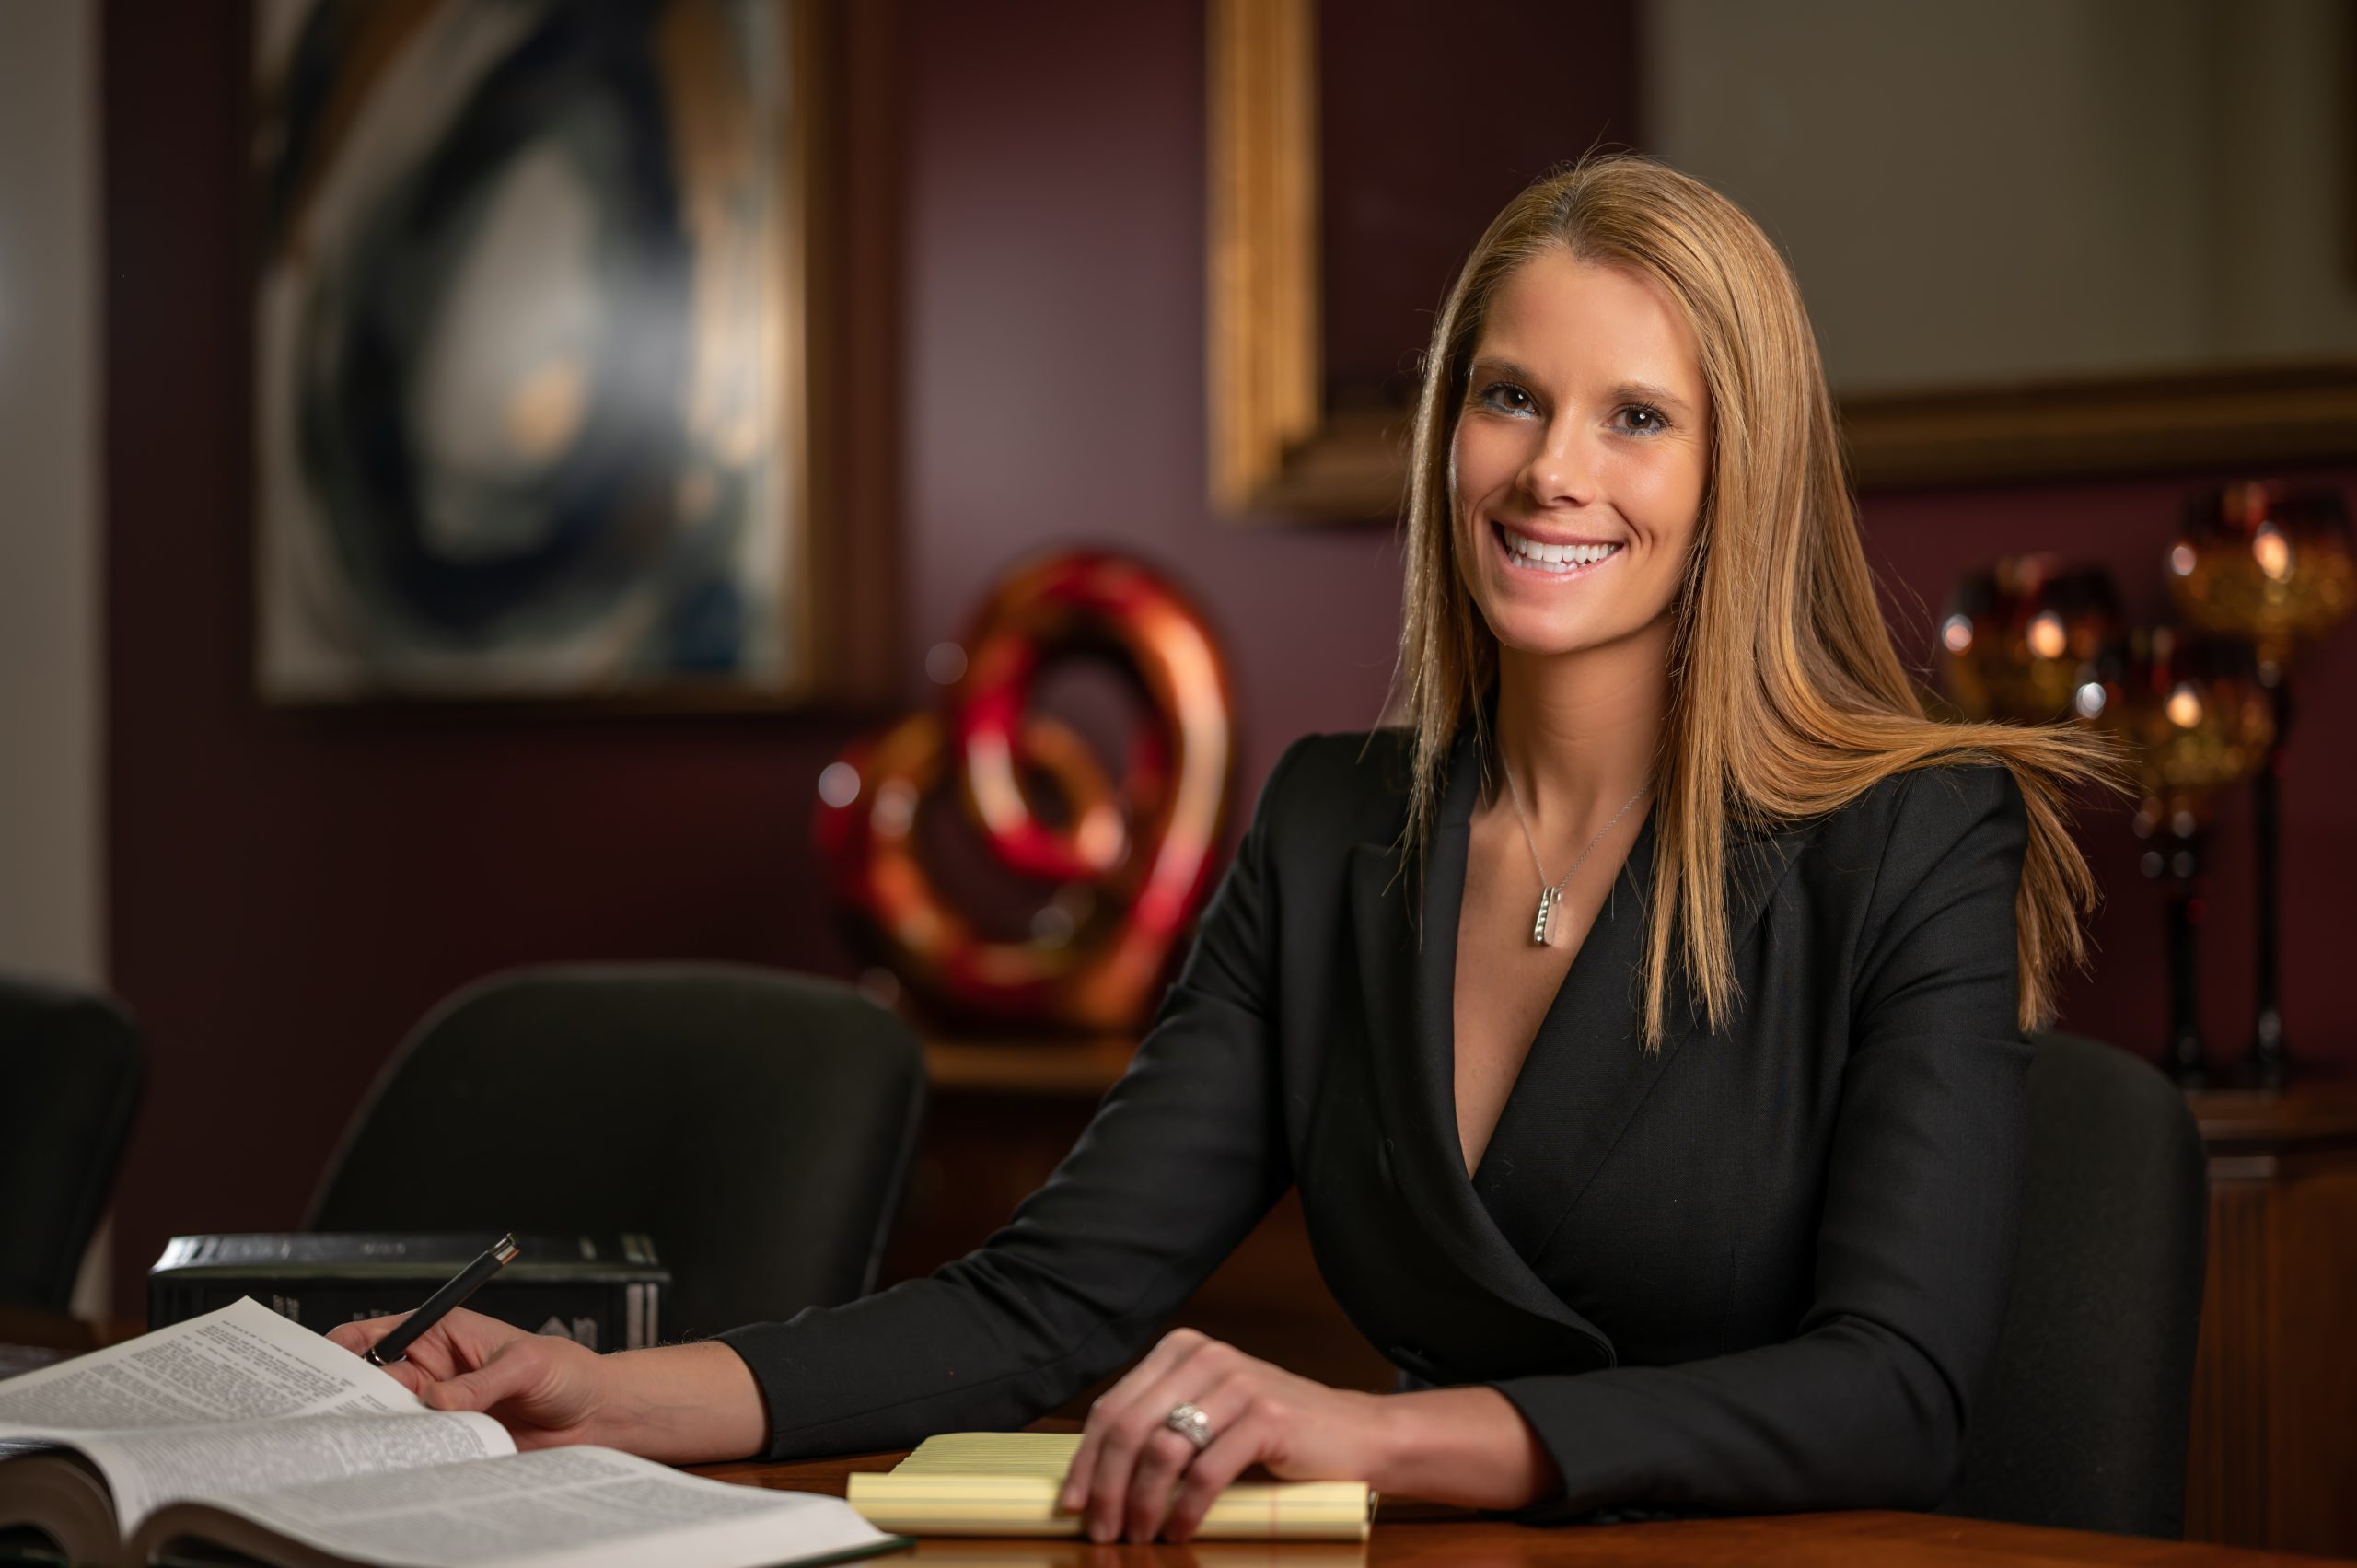 WV Divorce & Family Law Office - Hillard & Swartz, LLP